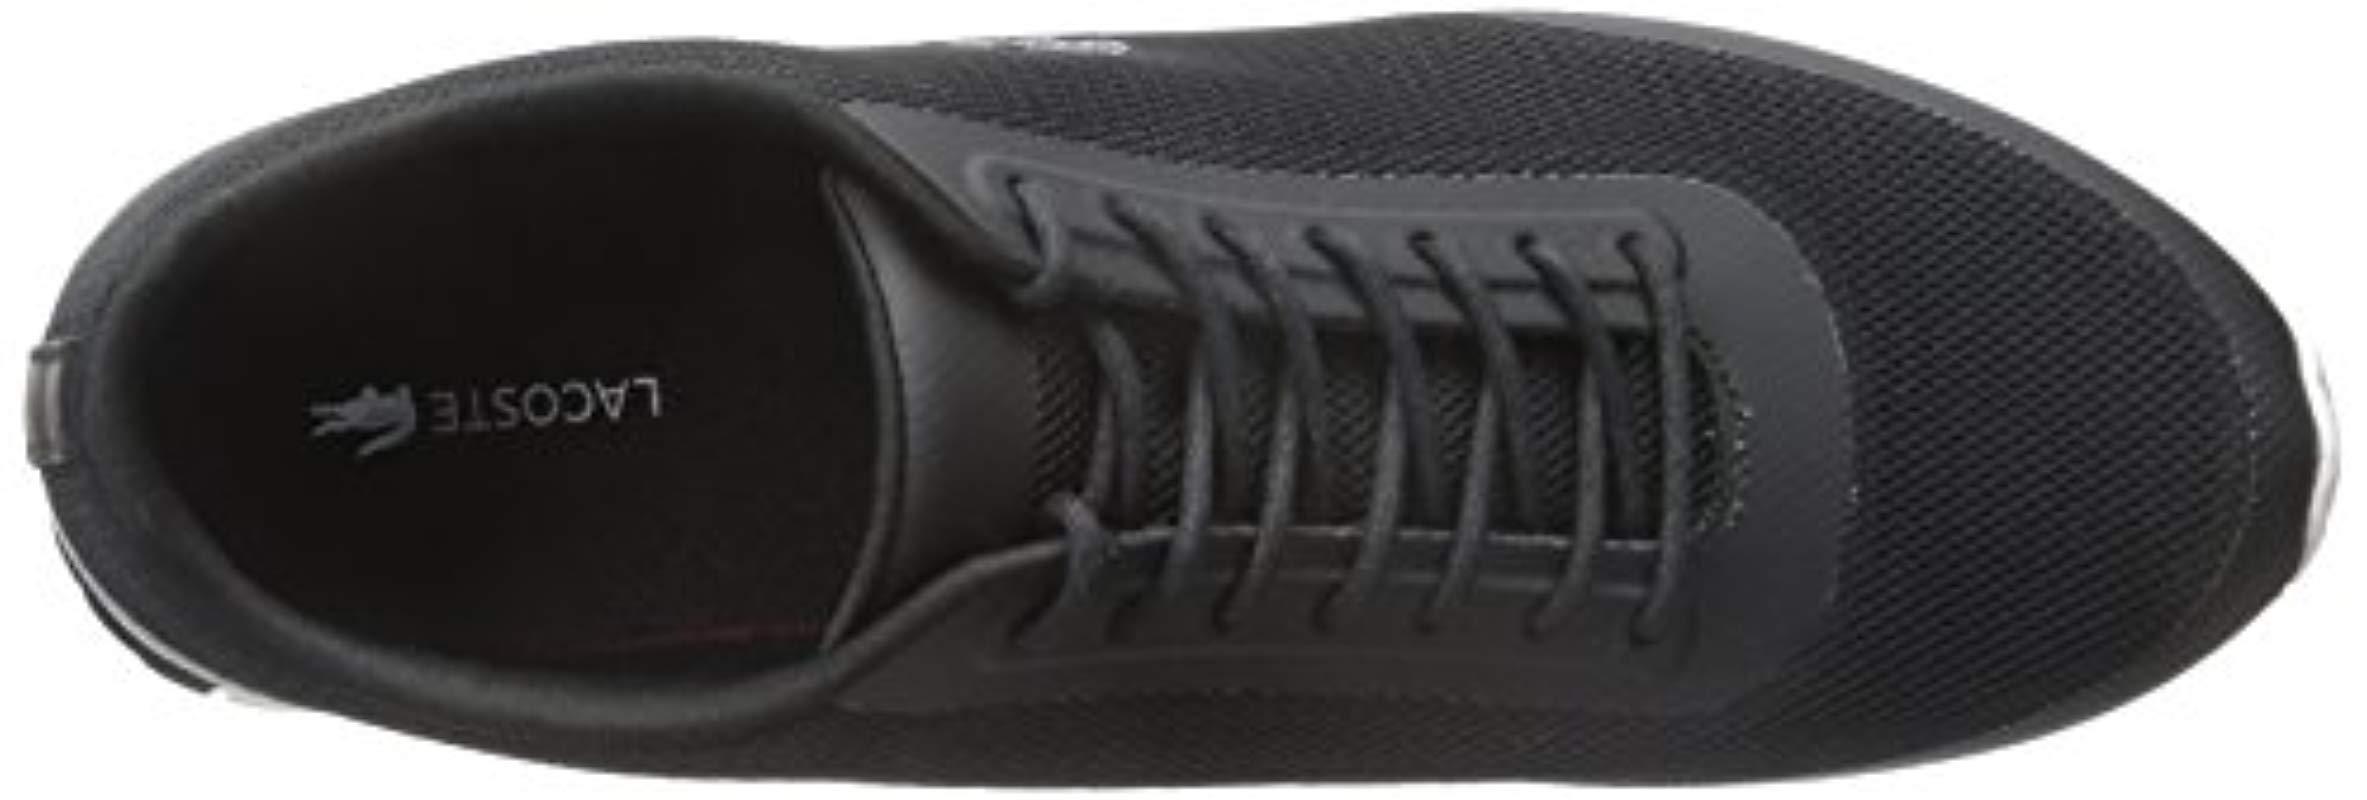 becd06355 Lyst - Lacoste Helaine Runner 116 3 Fashion Sneaker in Black